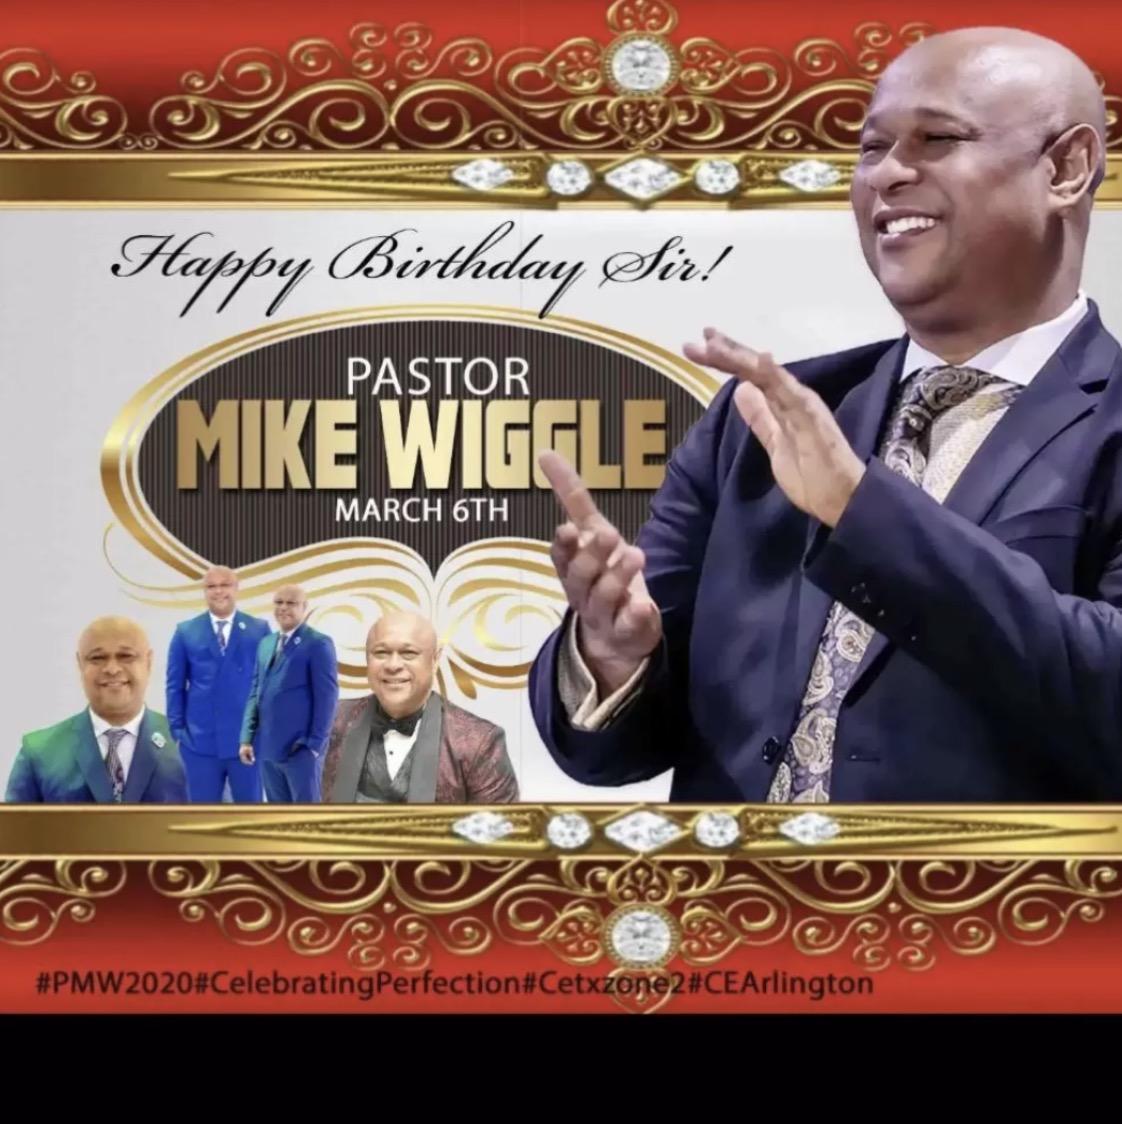 Happy birthday Pastor. Our Esteemed